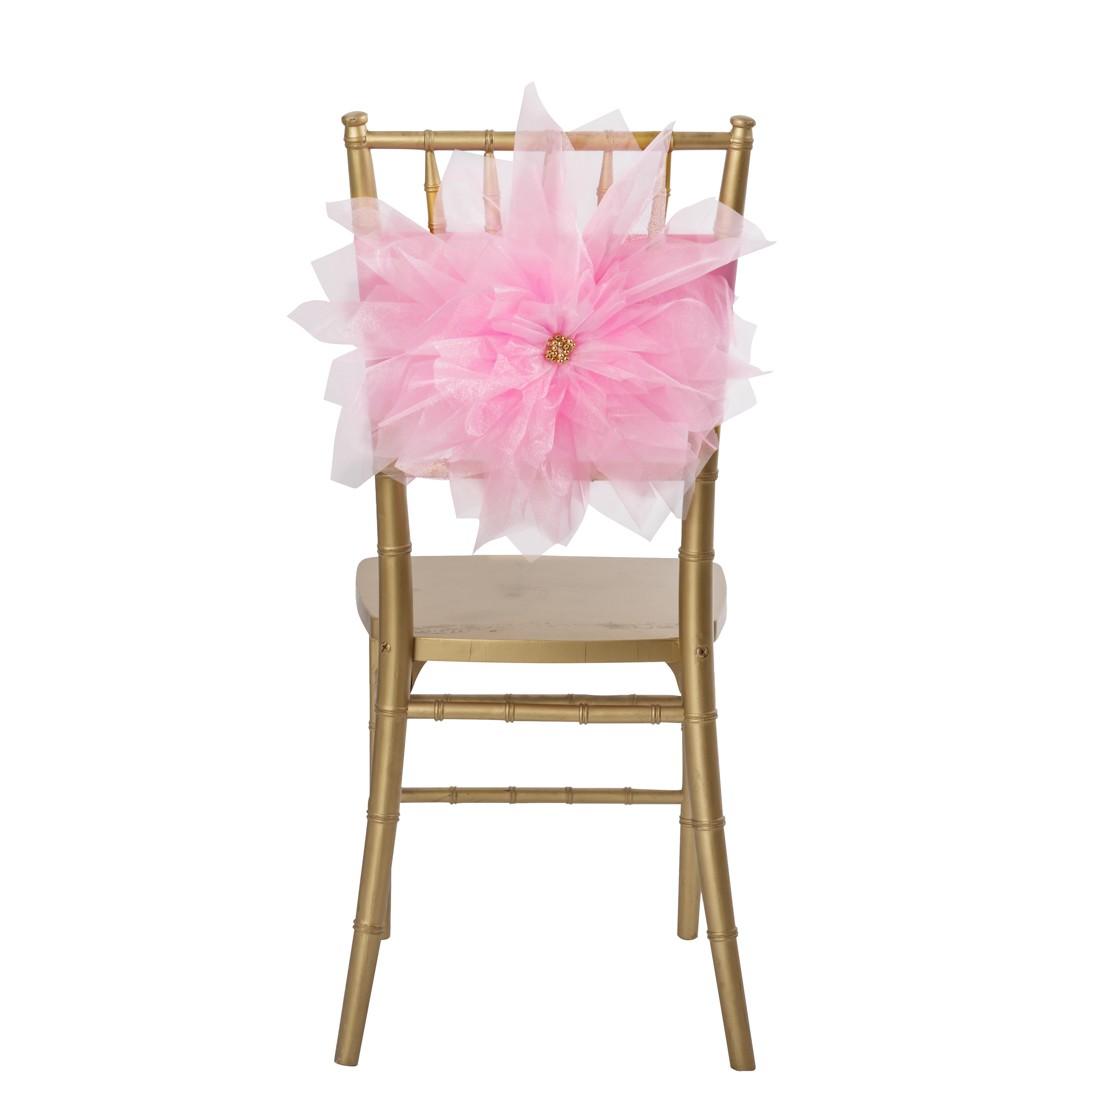 PInk flower sash